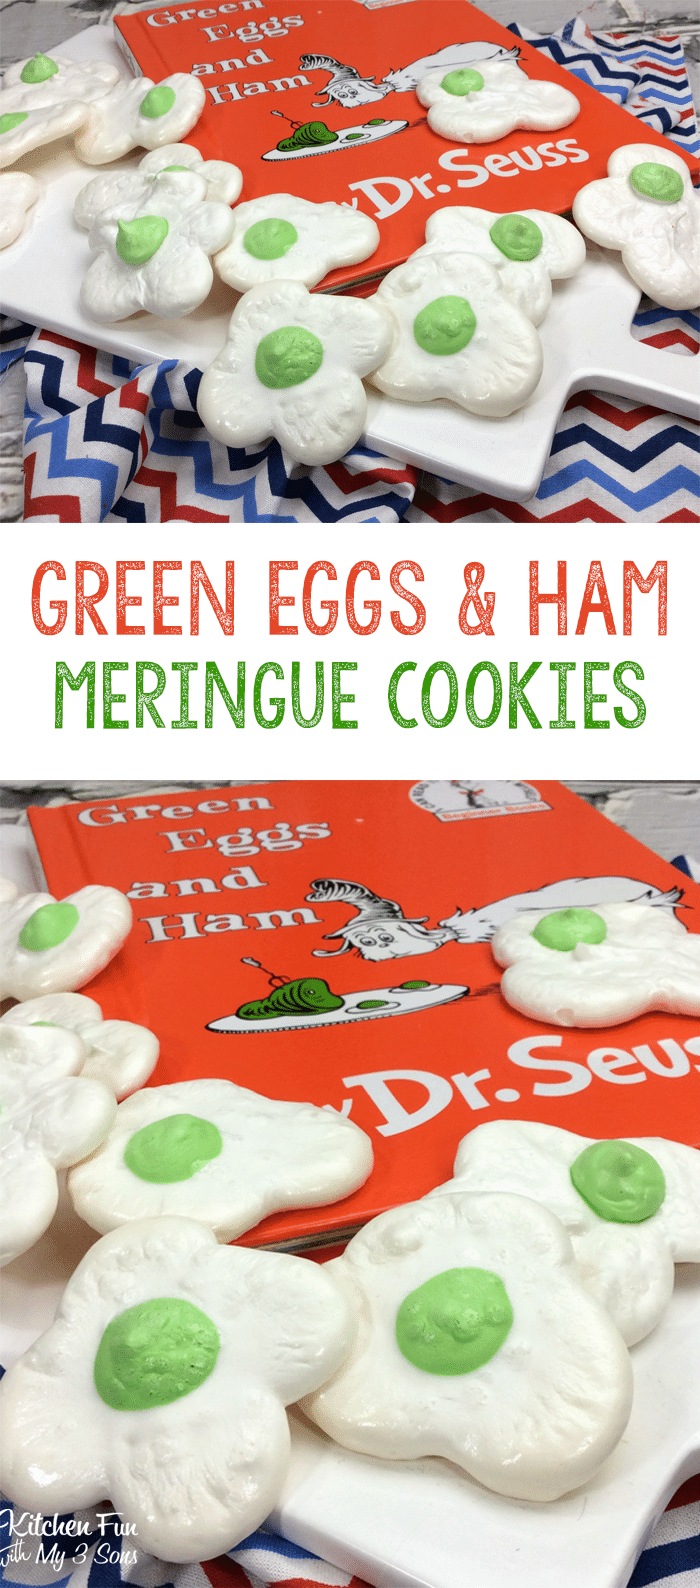 Dr Seuss Green Egg Meringue Cookies